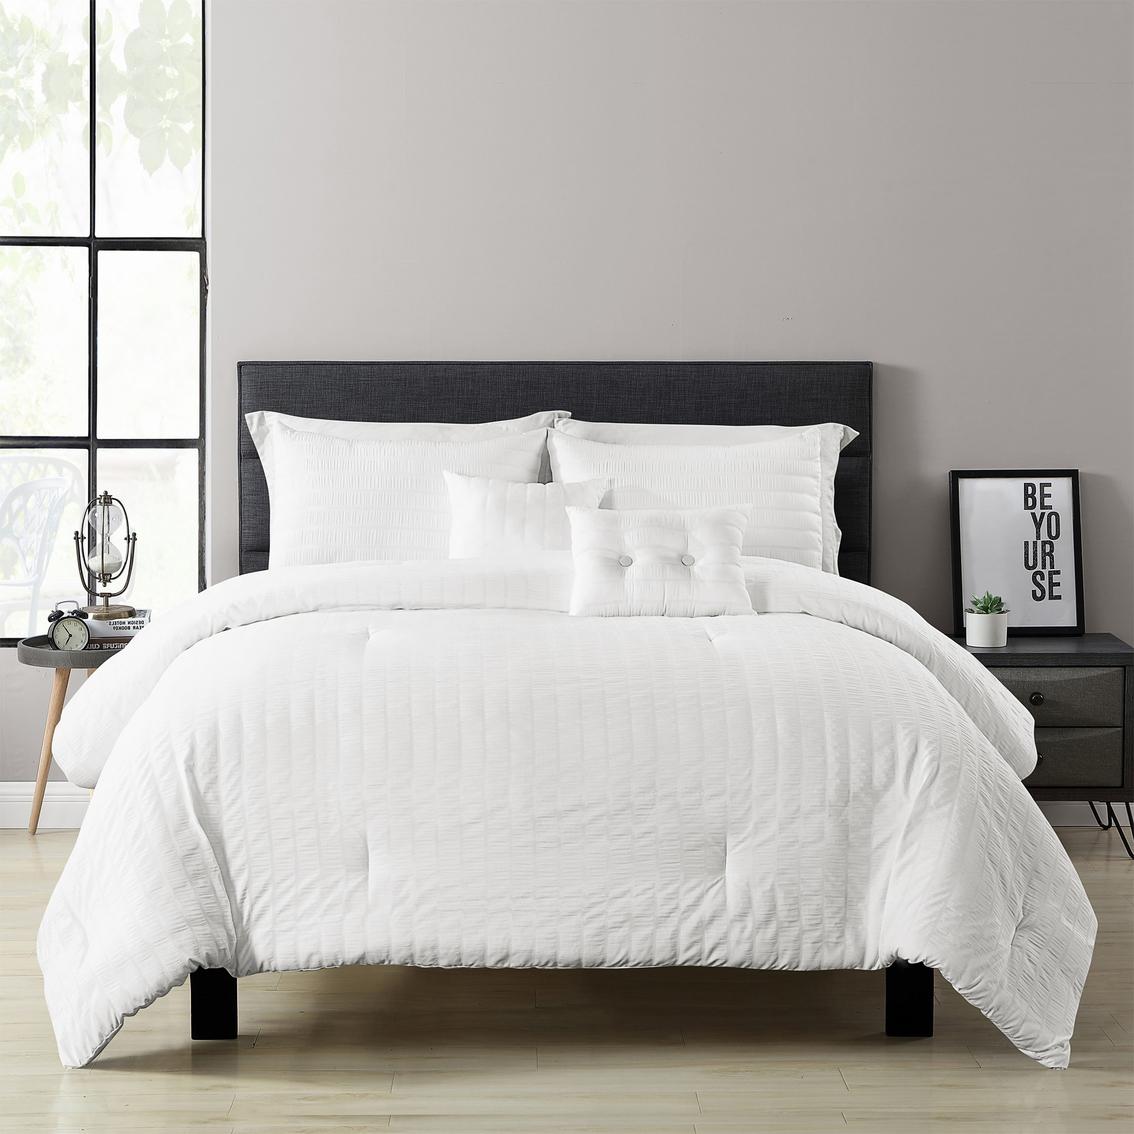 Lush Decor Farmhouse Seersucker 5 Pc Comforter Set Bedding Sets Household Shop The Exchange